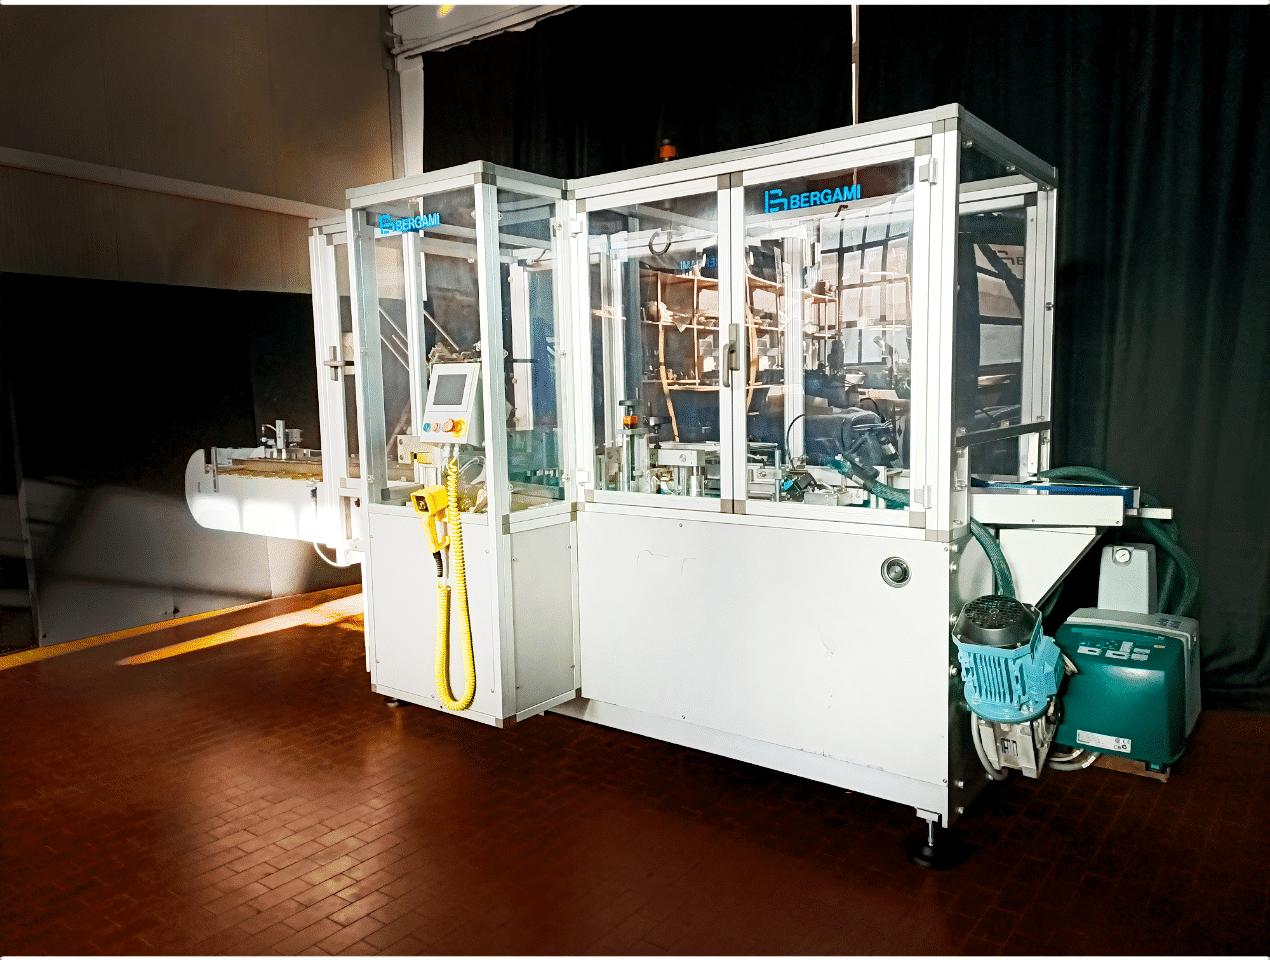 Astucciatrice automatica orizzontale Bergami AS70